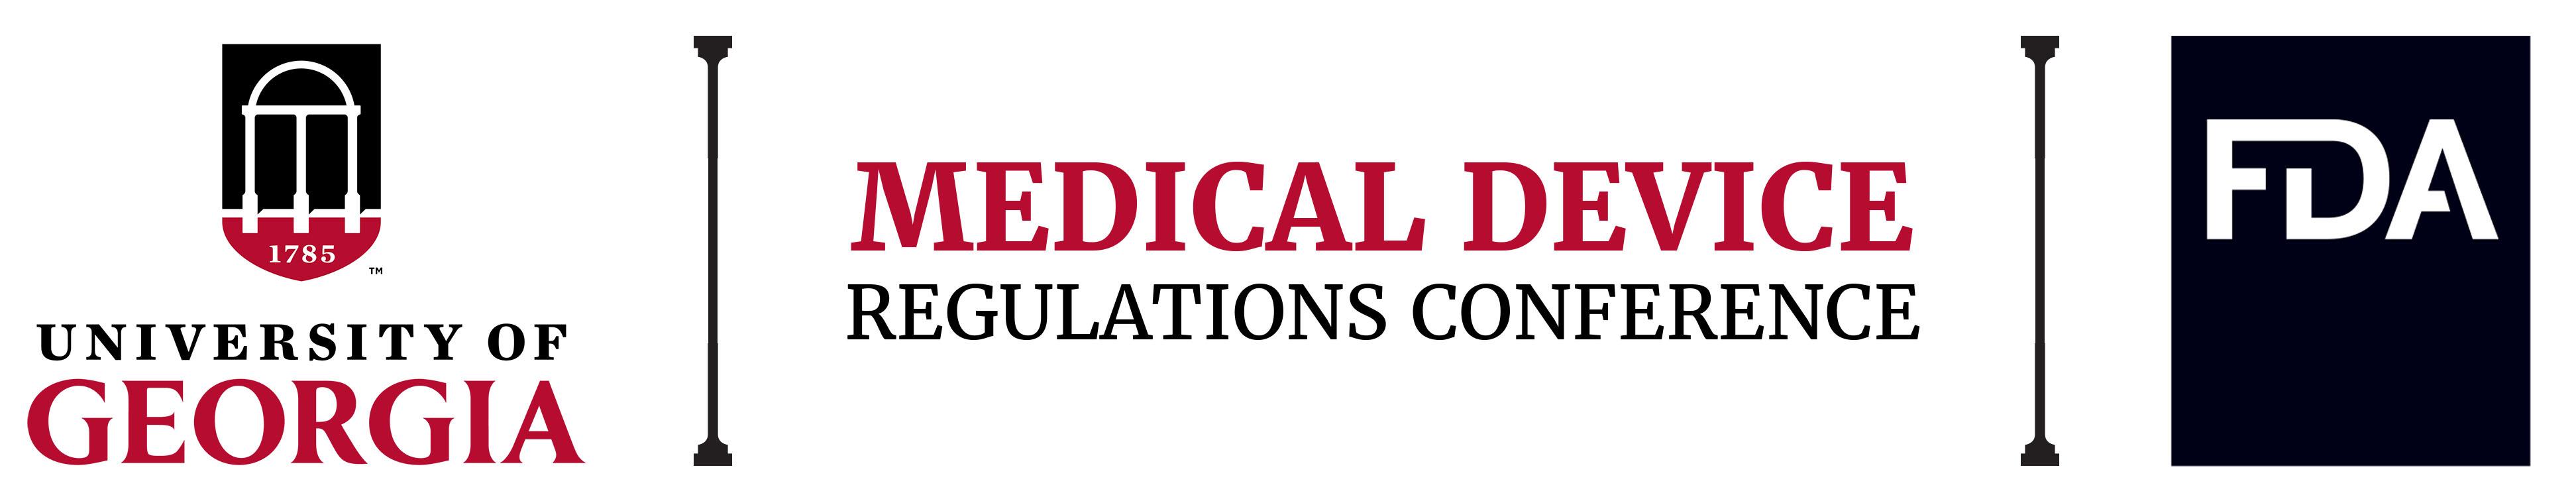 Medical Device Regulations Conference